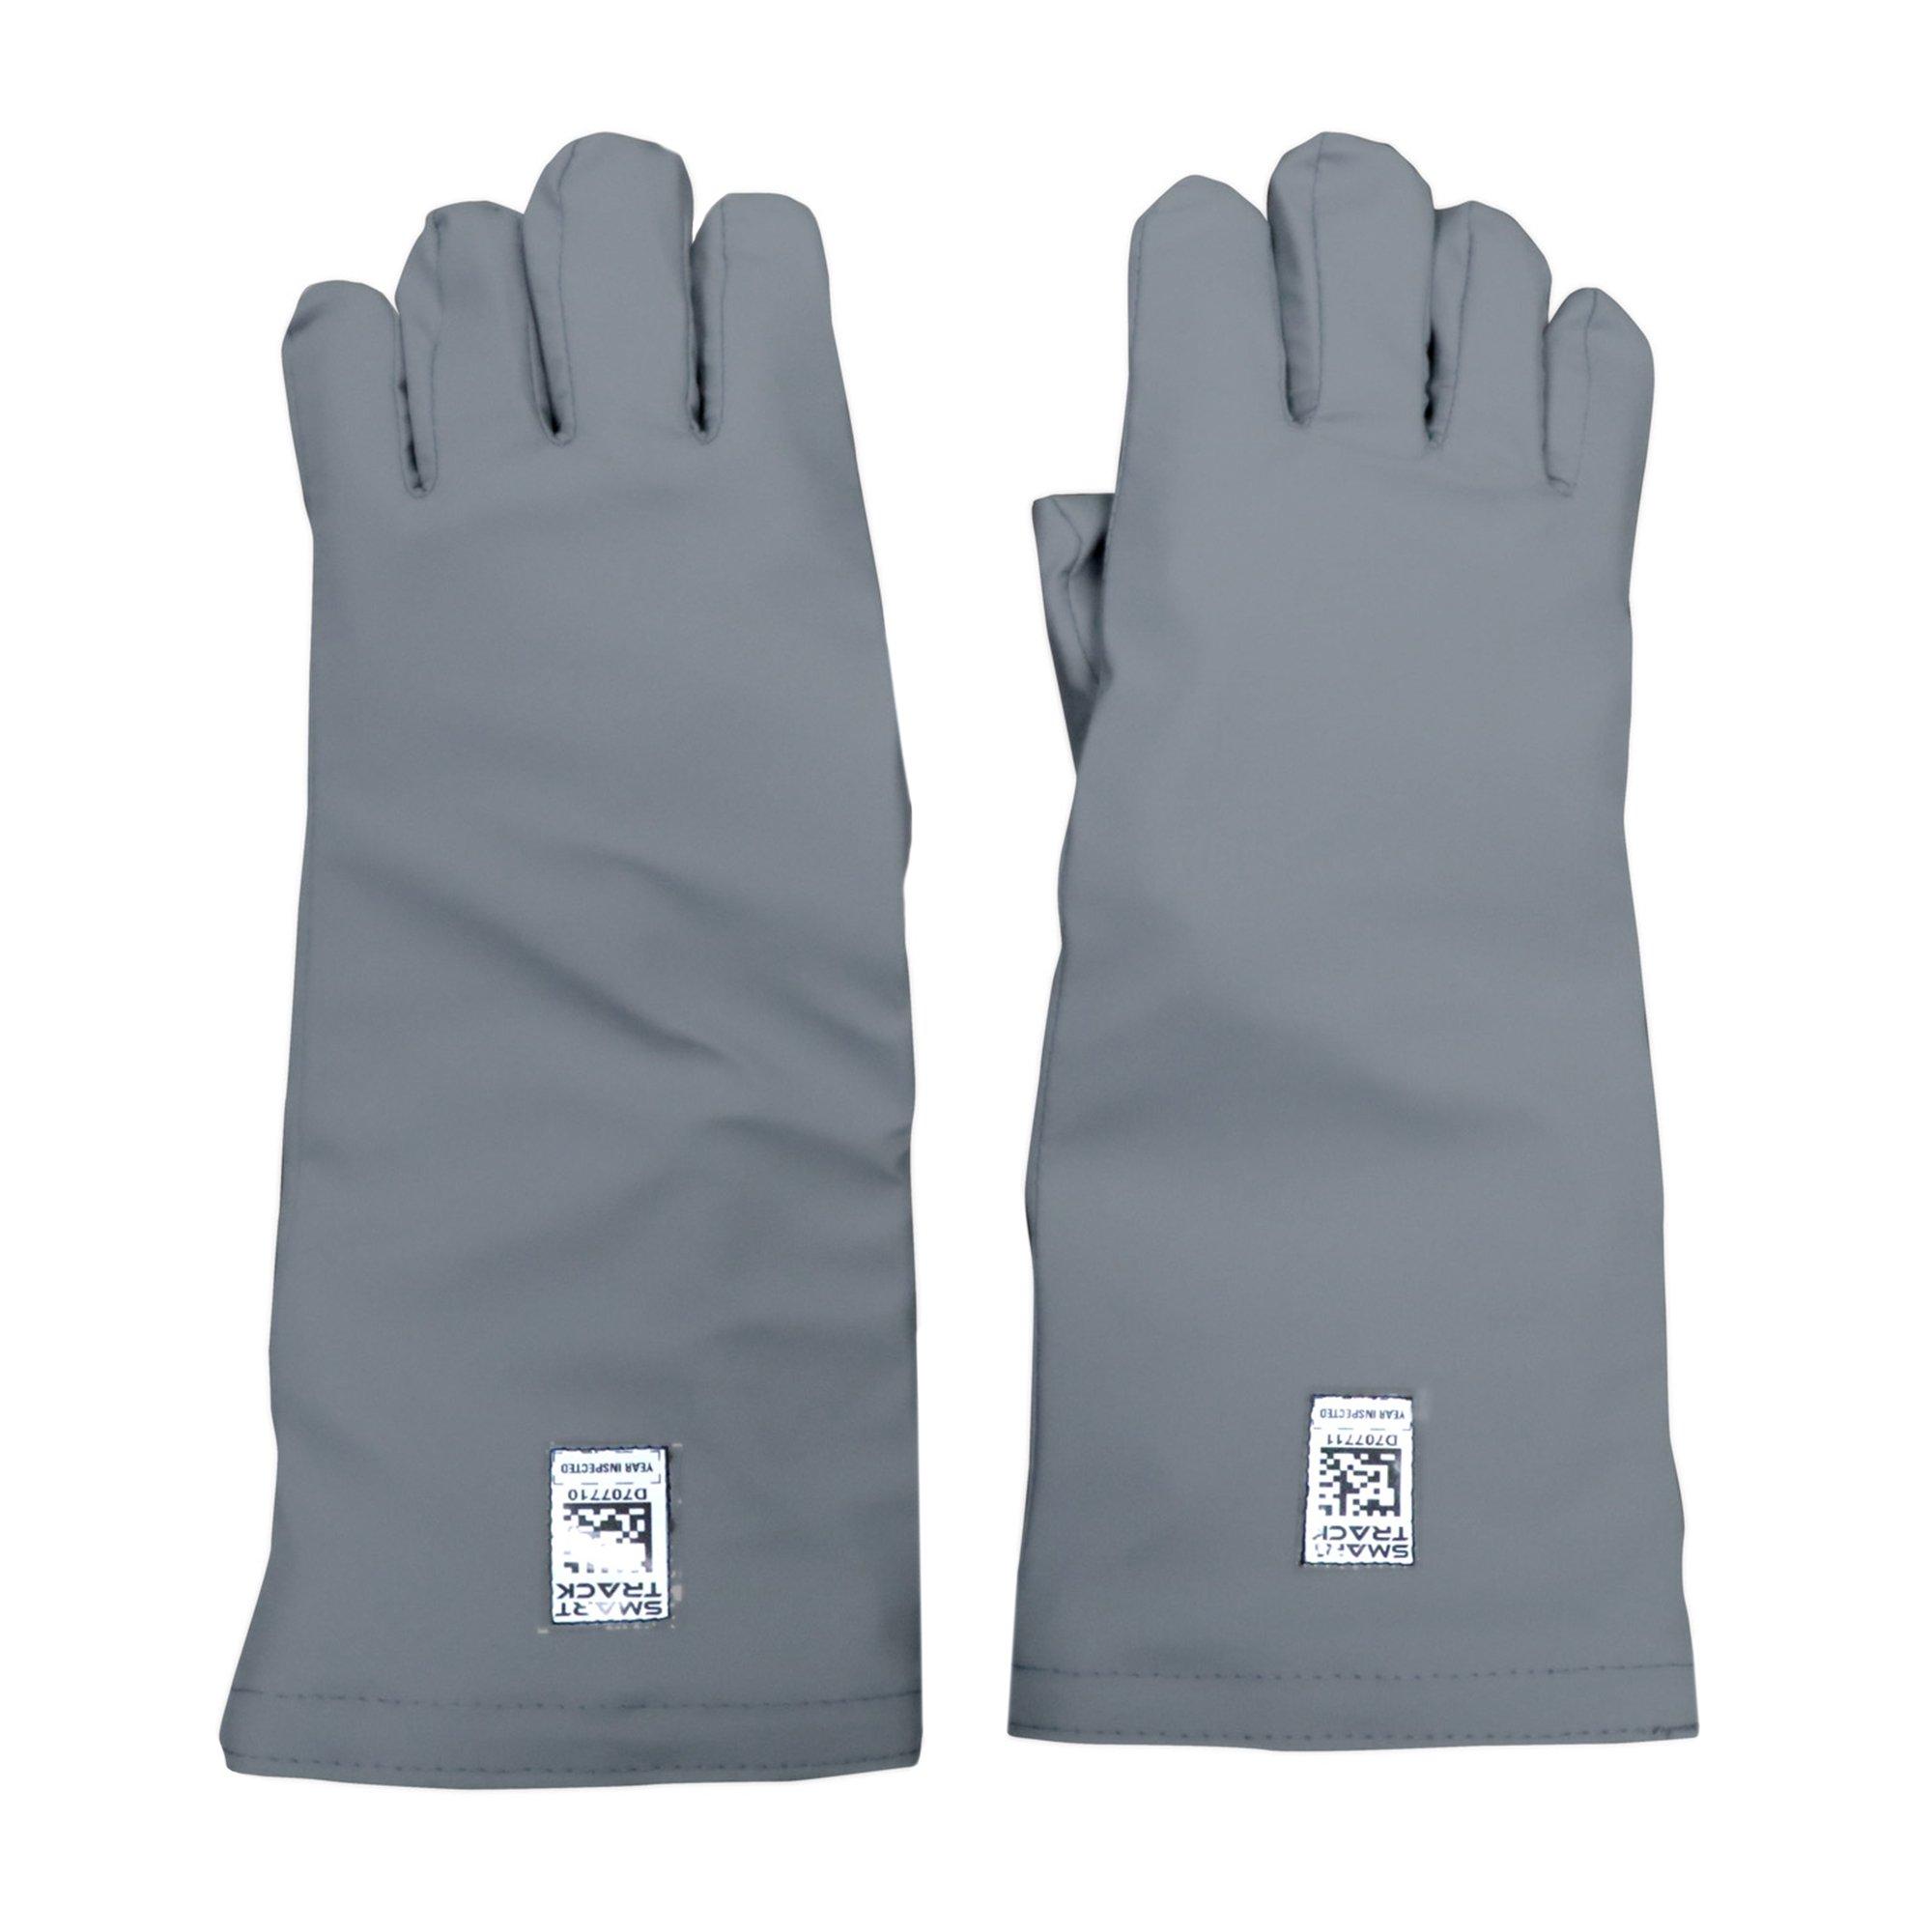 Revolution Maxi-Flex 5 Finger Lead Gloves